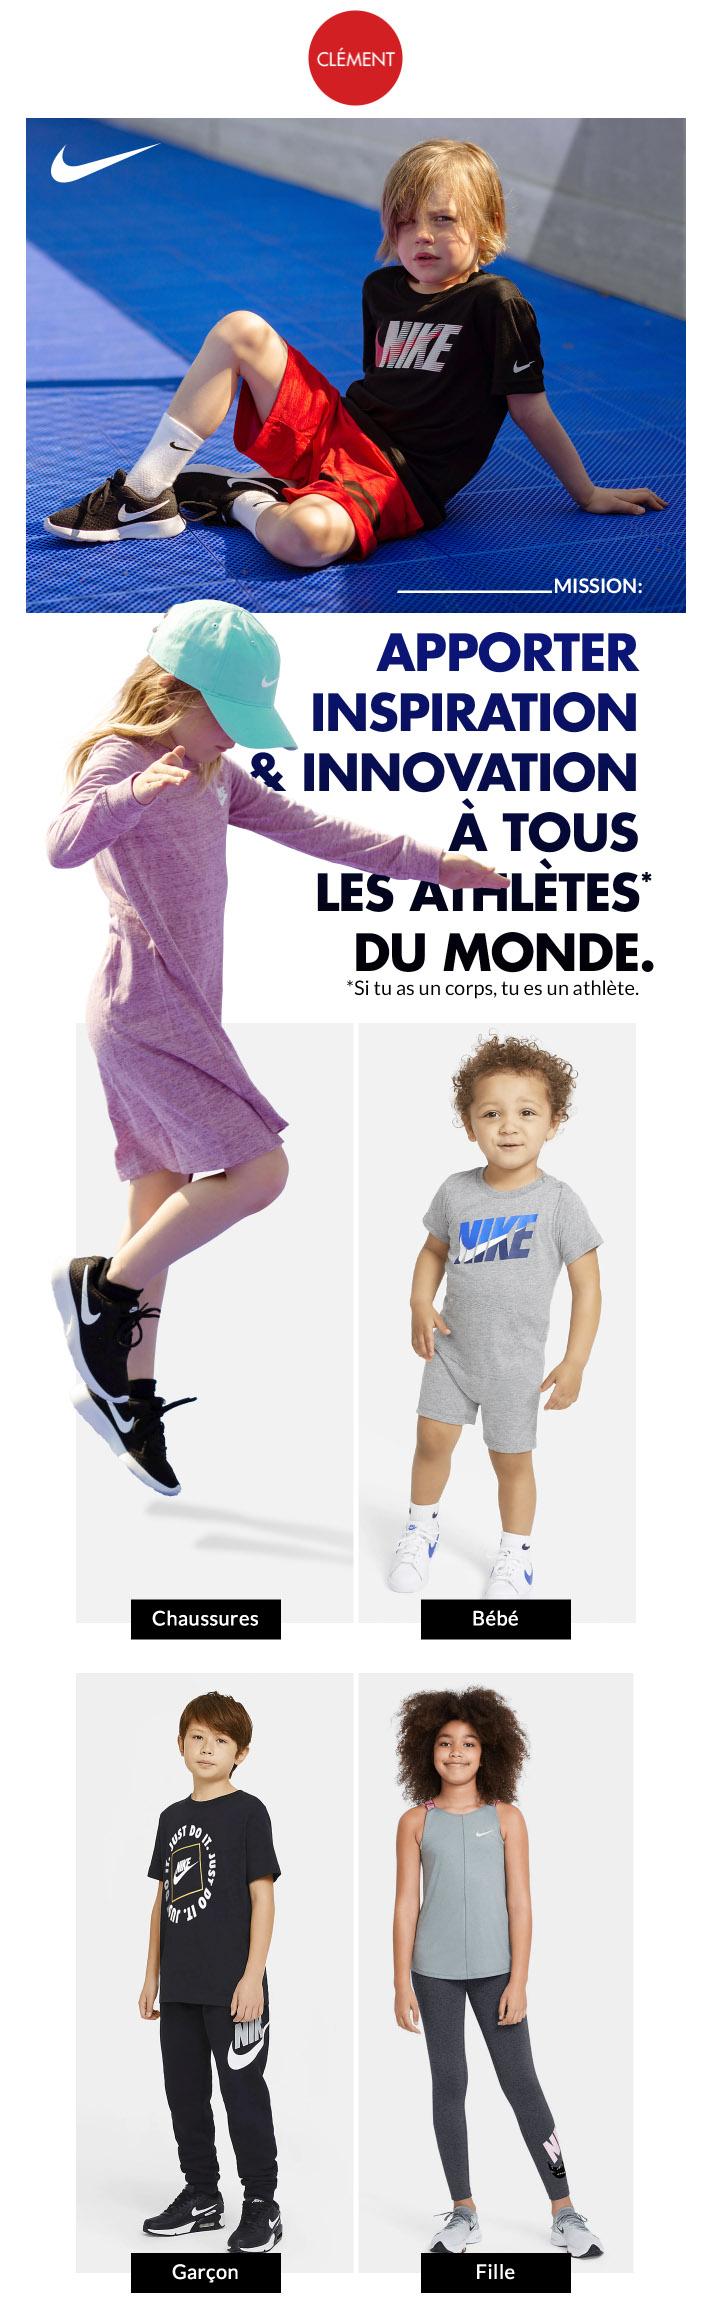 La Collection Nike